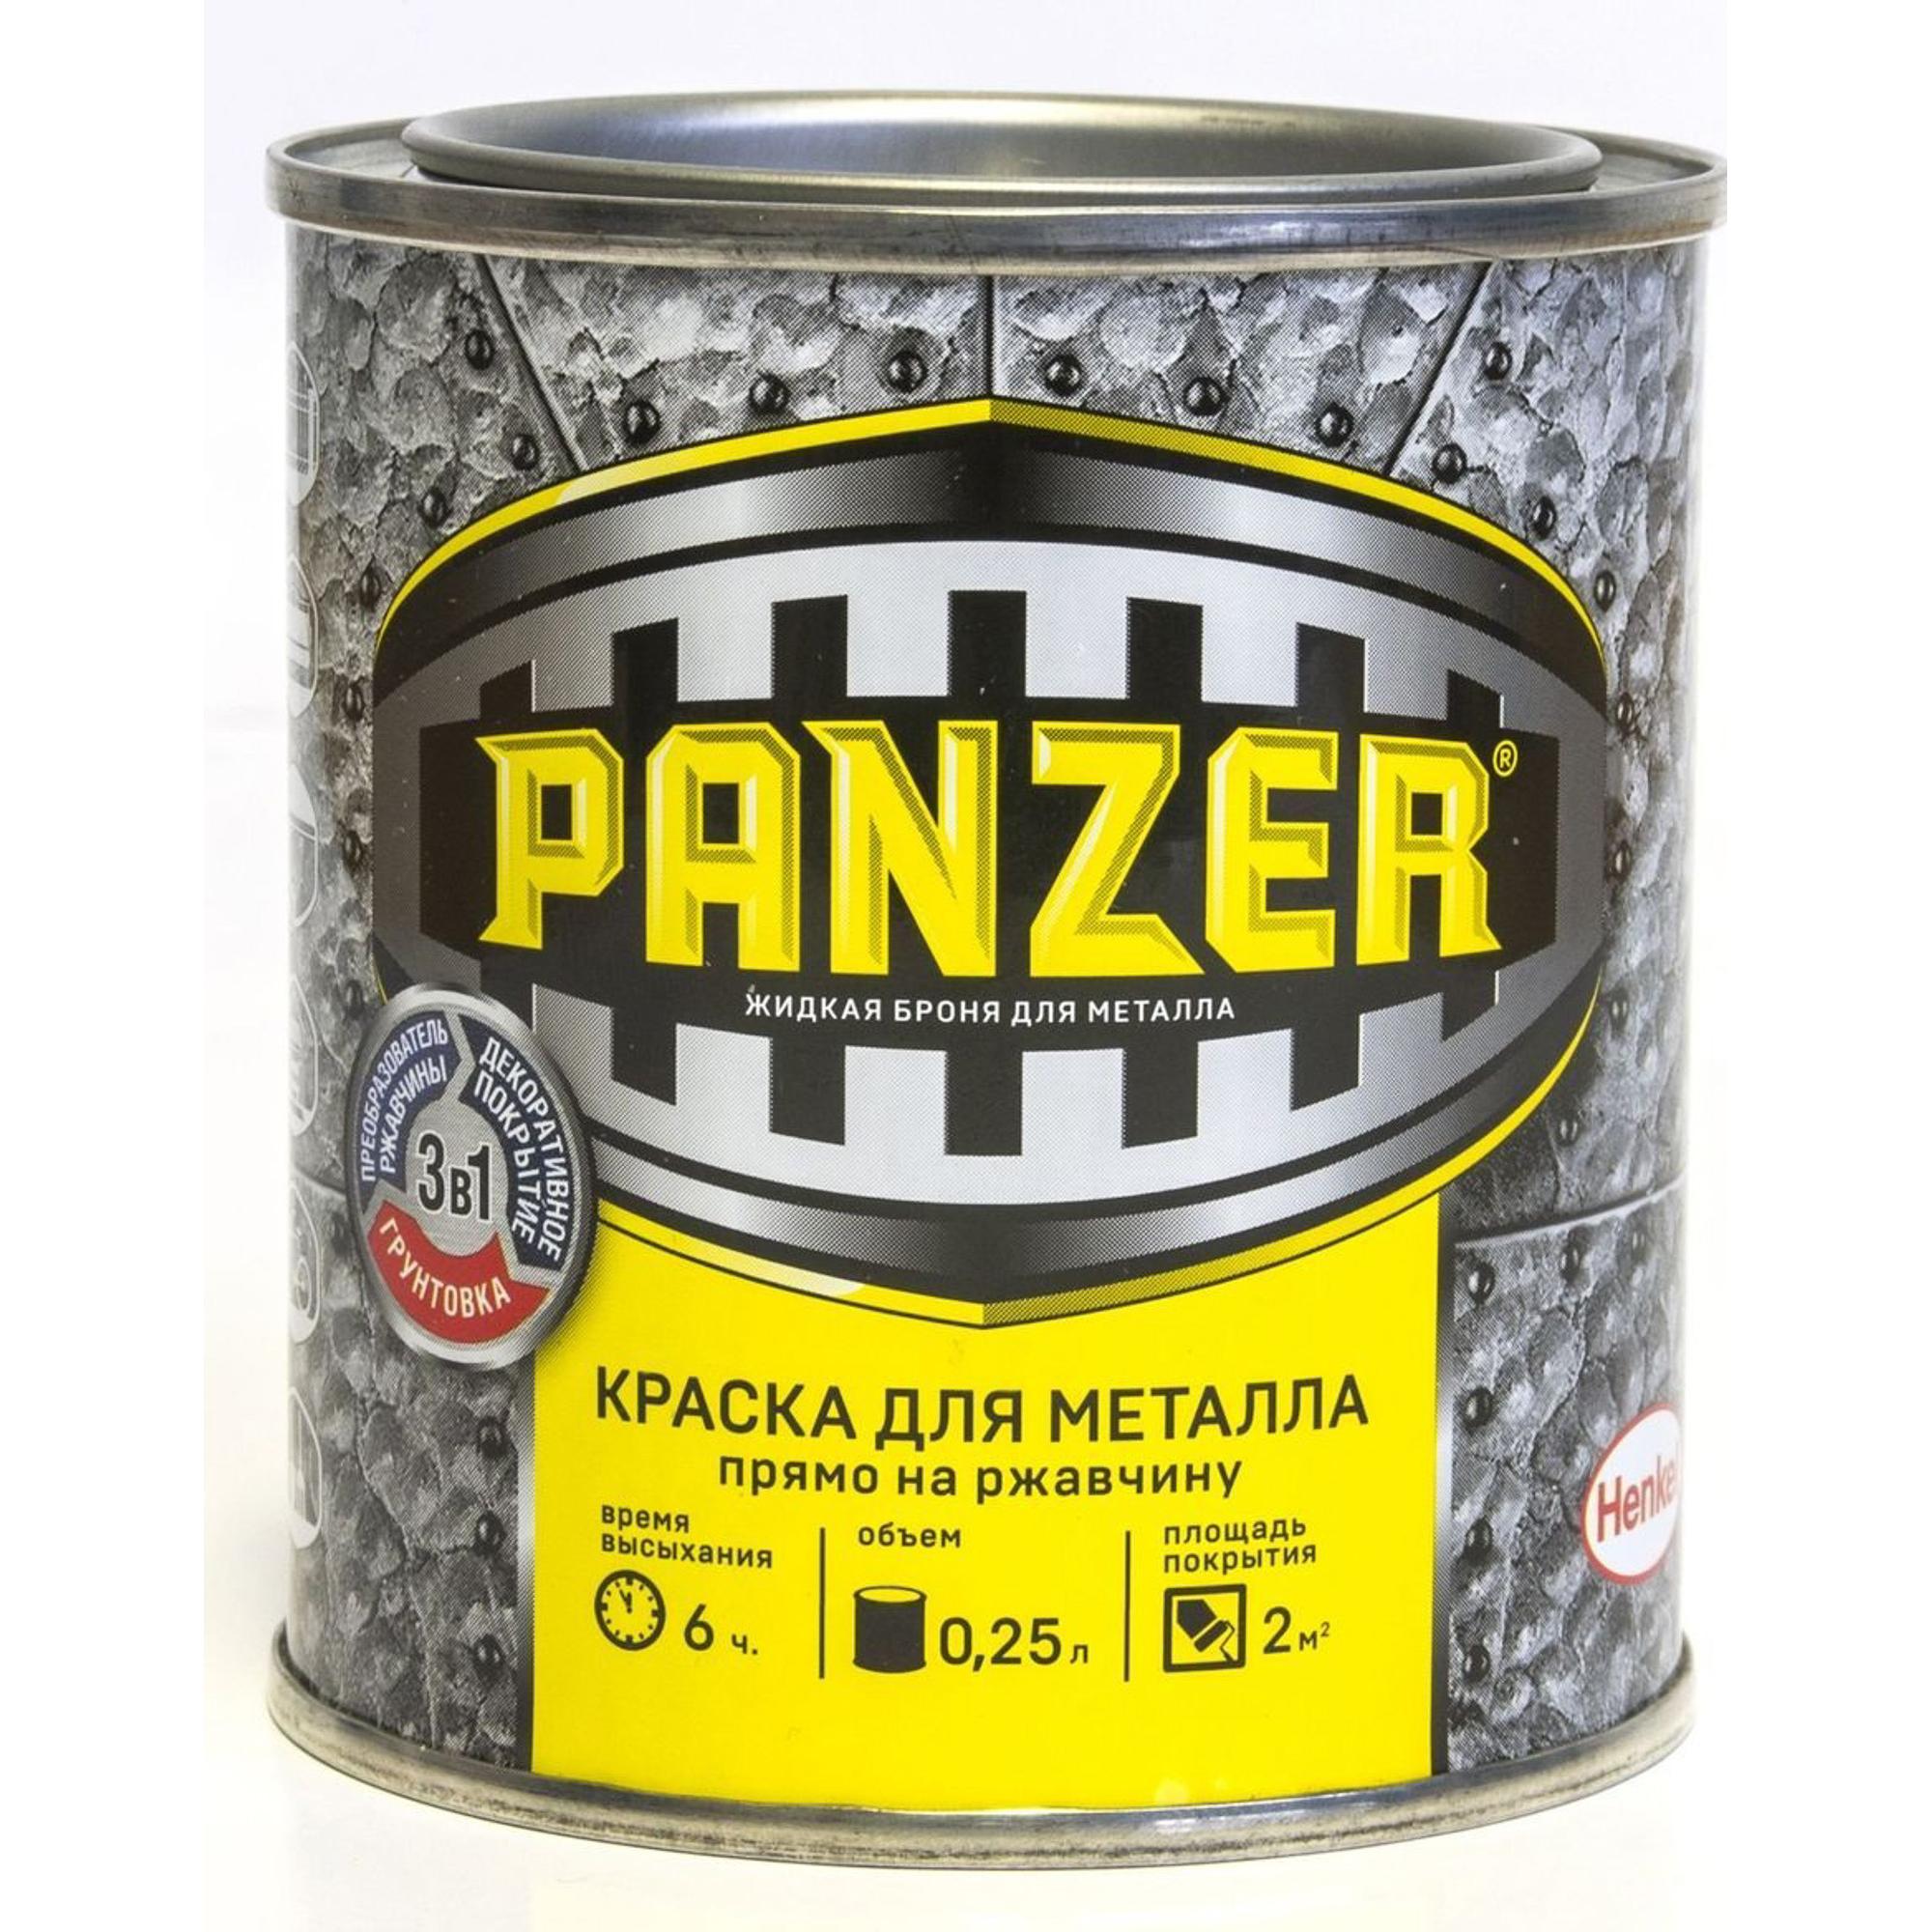 Краска для металла Panzer молотковая золотистая 0.25л